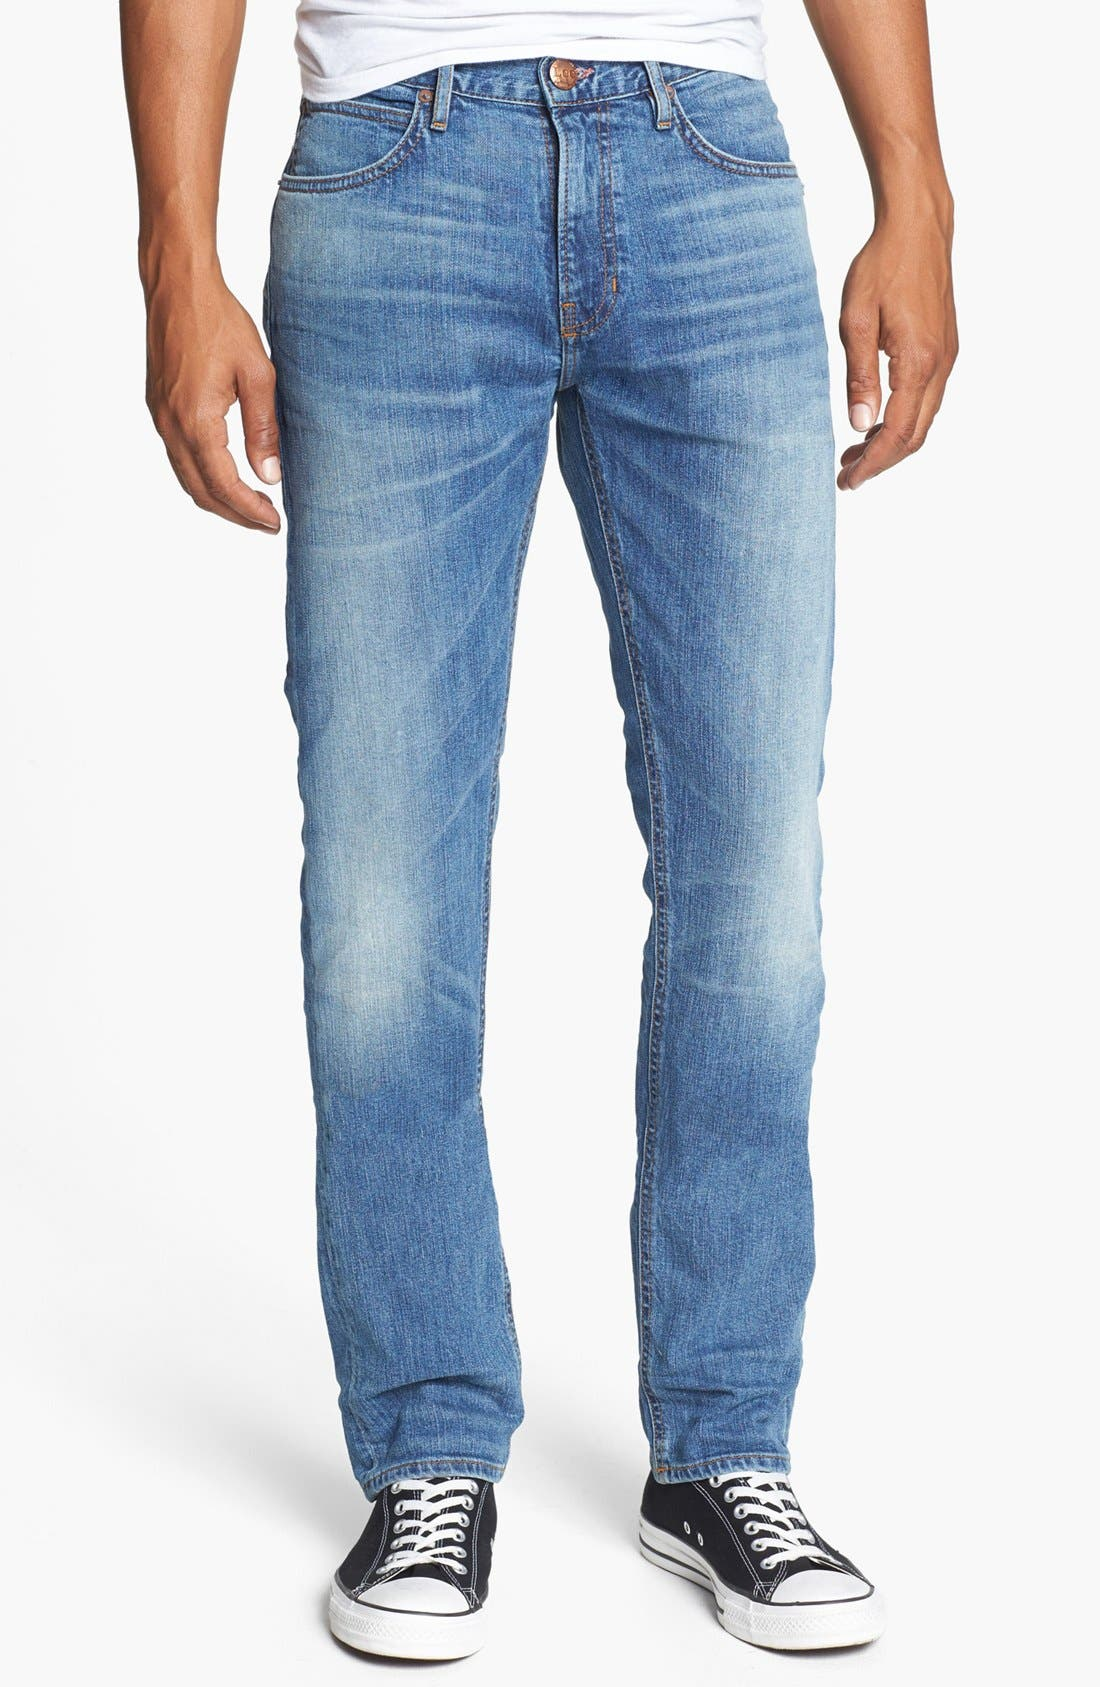 Alternate Image 1 Selected - Lee 101 USA Lean Straight Leg Jeans (Dry Dust)